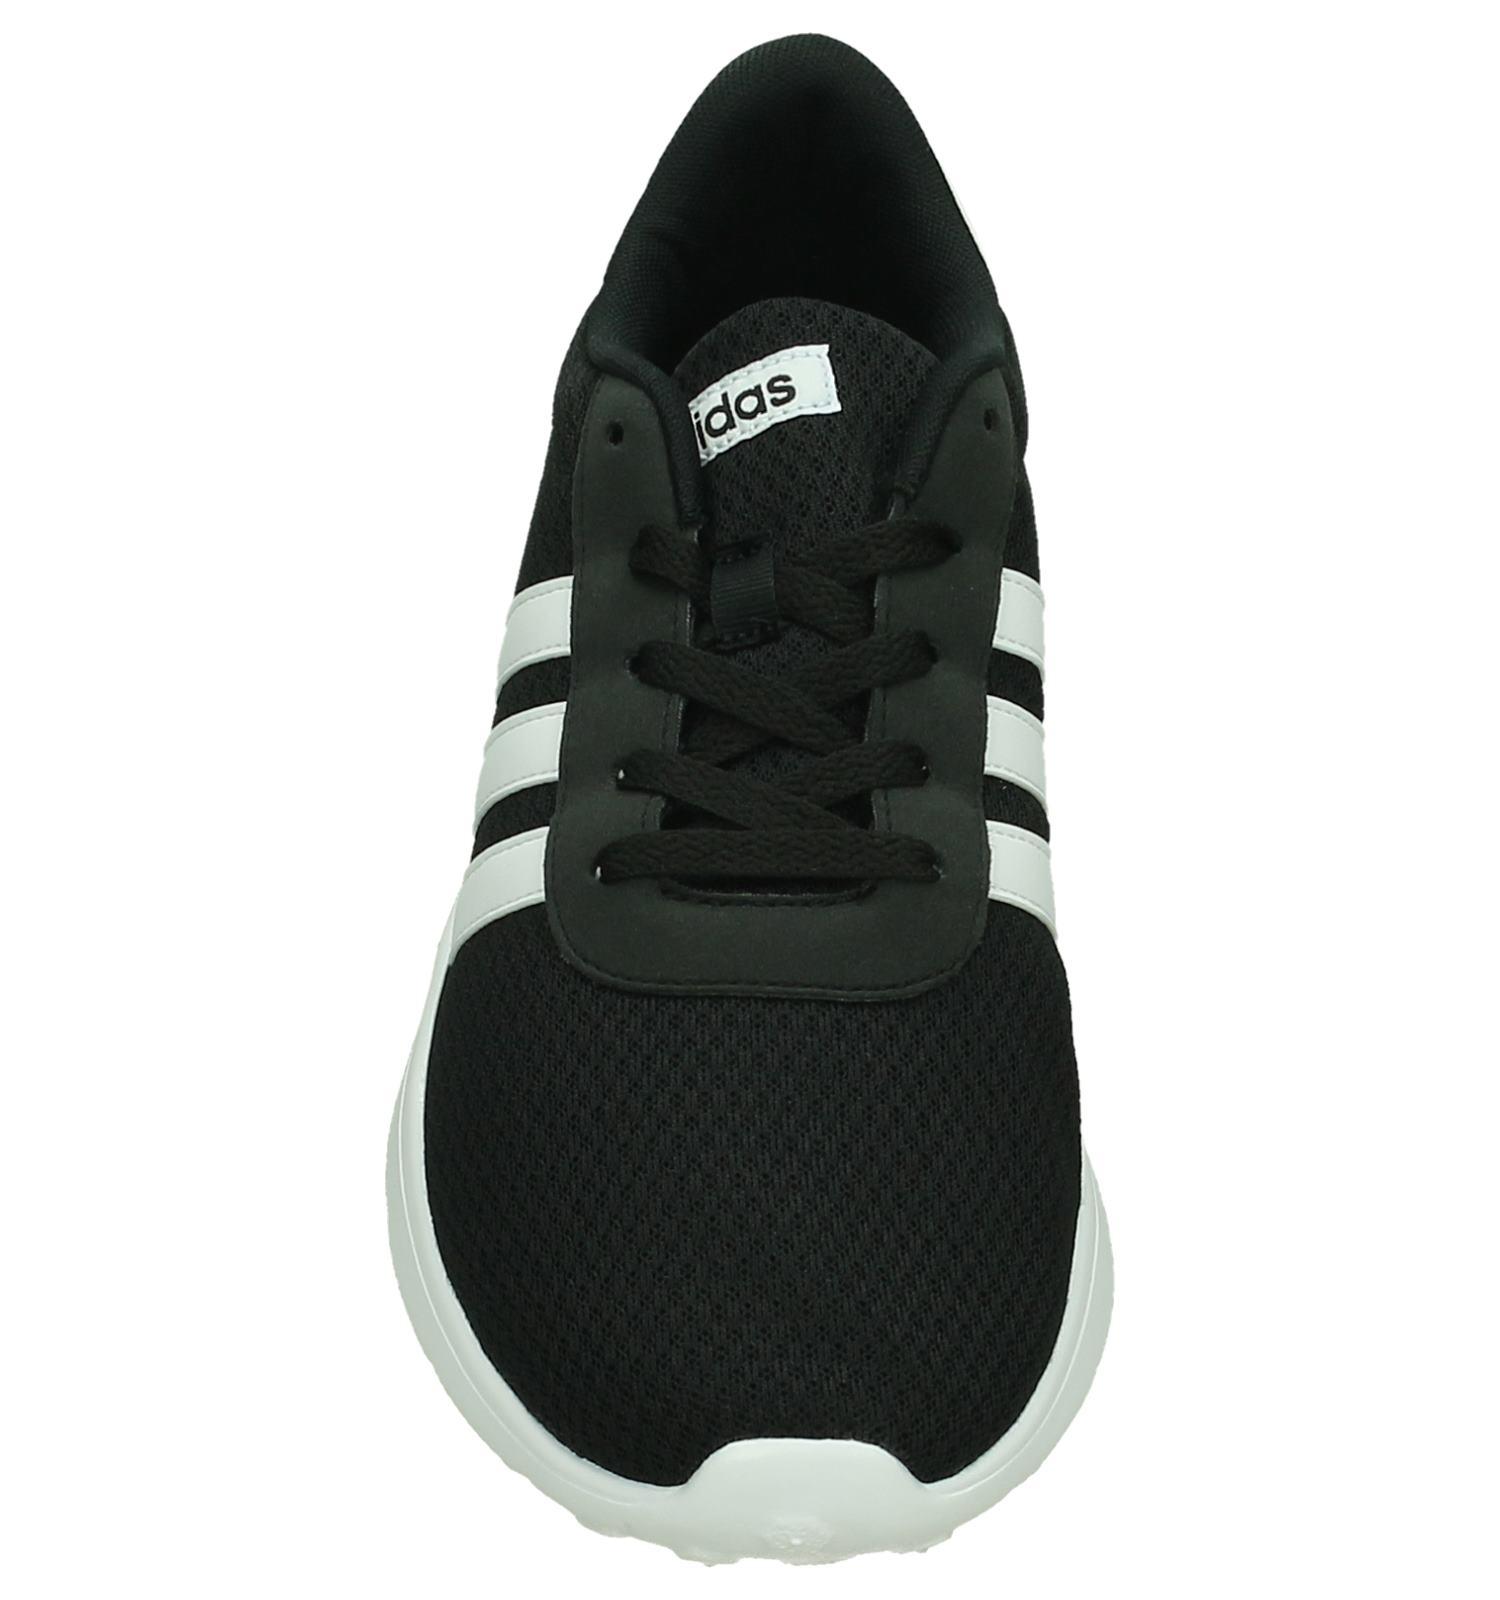 9e2d69bad61 Zwarte adidas Lite Racer Sneaker Runner | TORFS.BE | Gratis verzend en  retour